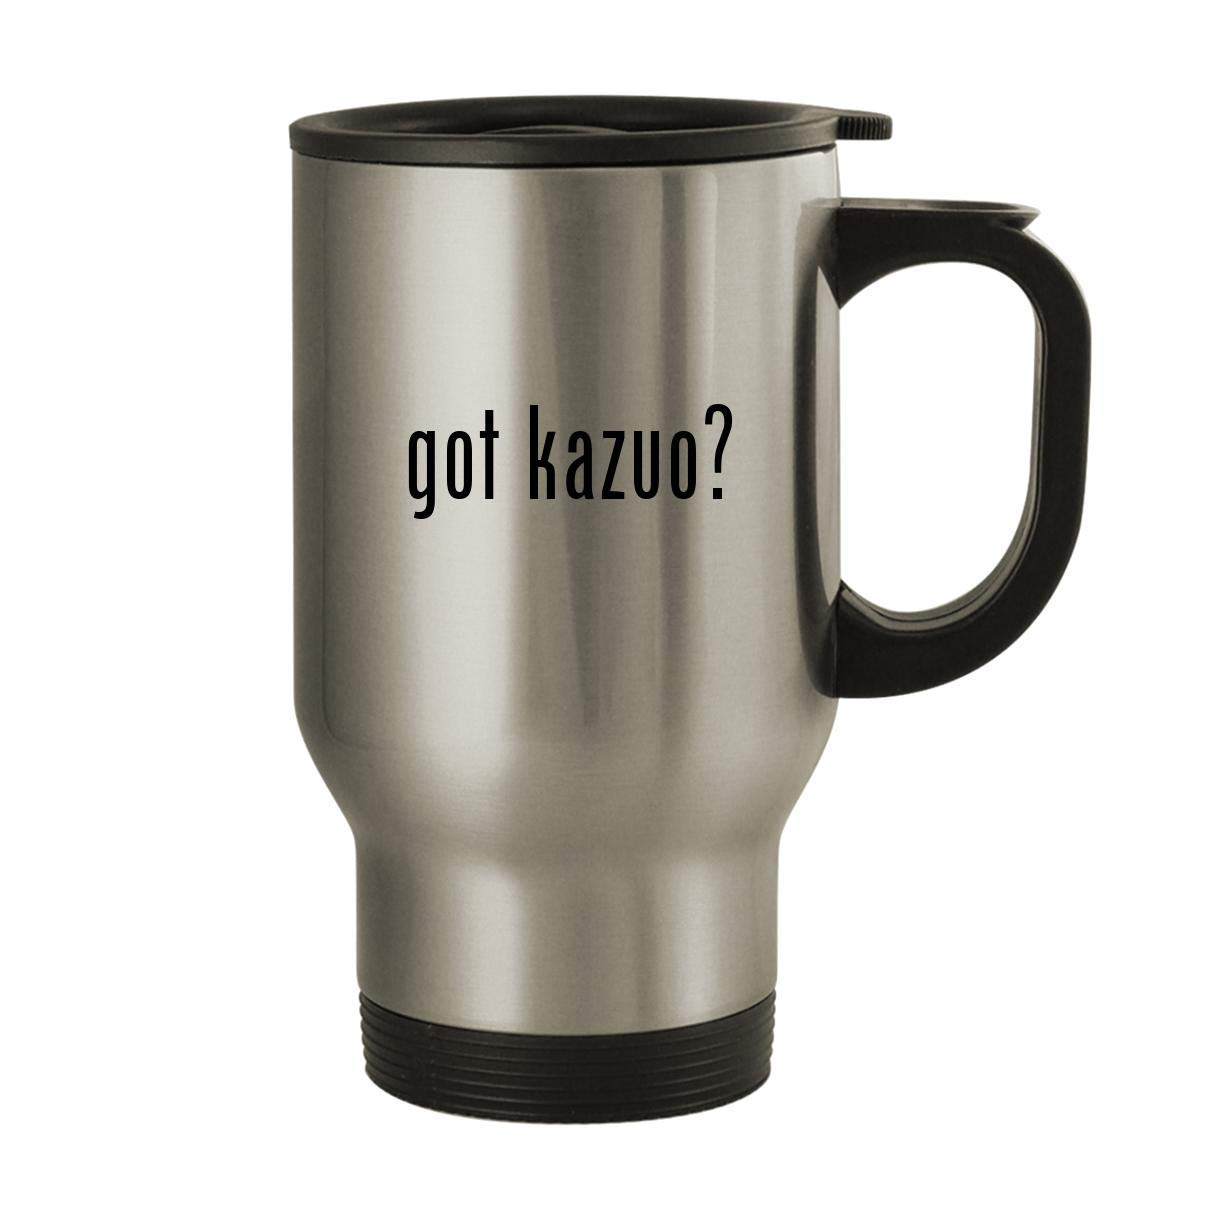 got kazuo? - Stainless Steel 14oz Travel Mug, Silver